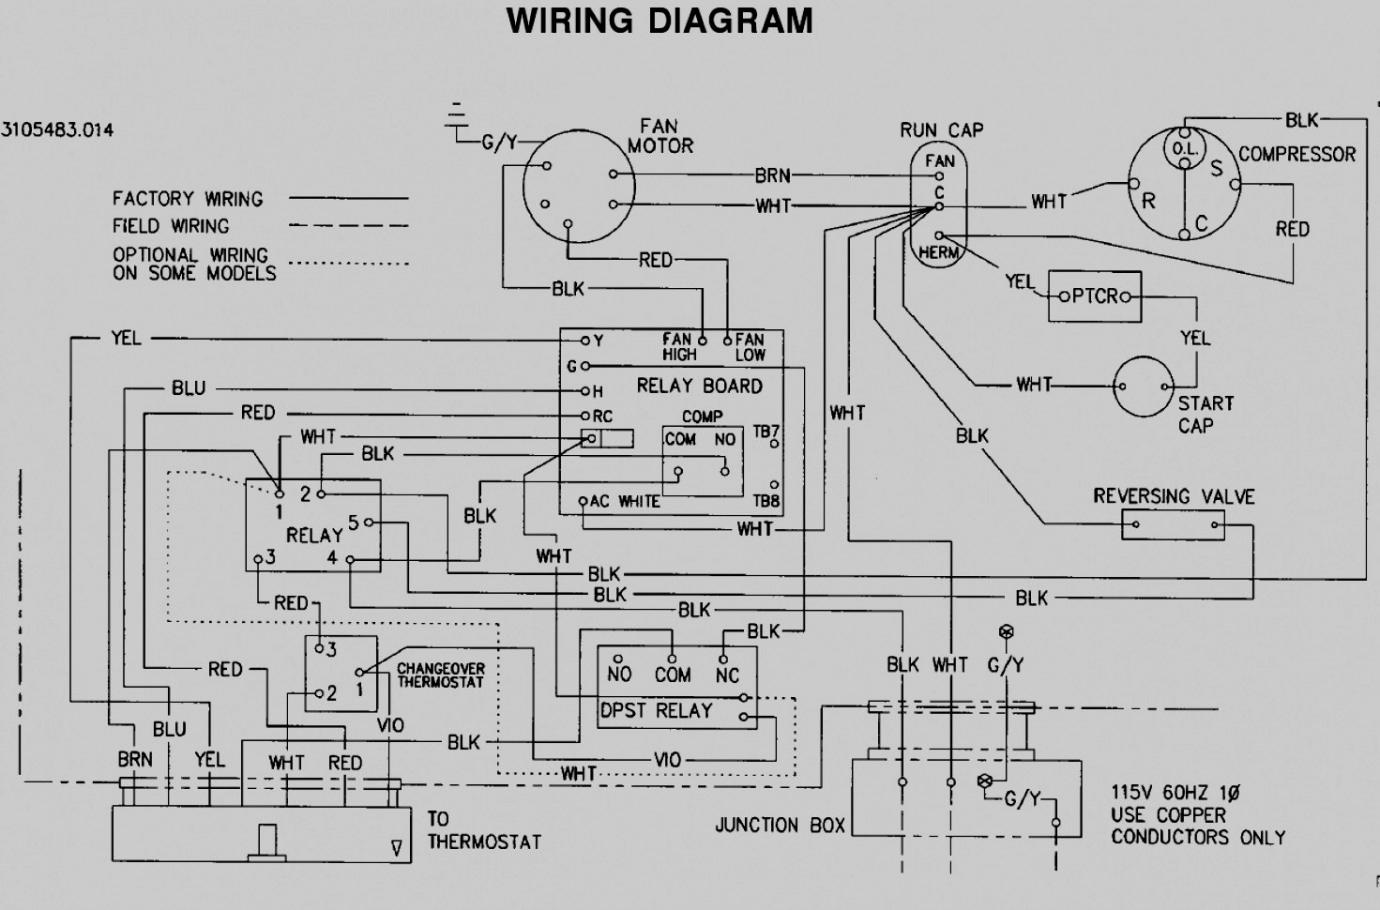 Rv Ac Thermostat Wiring - Wiring Diagram Data Oreo - Rv Thermostat Wiring Diagram